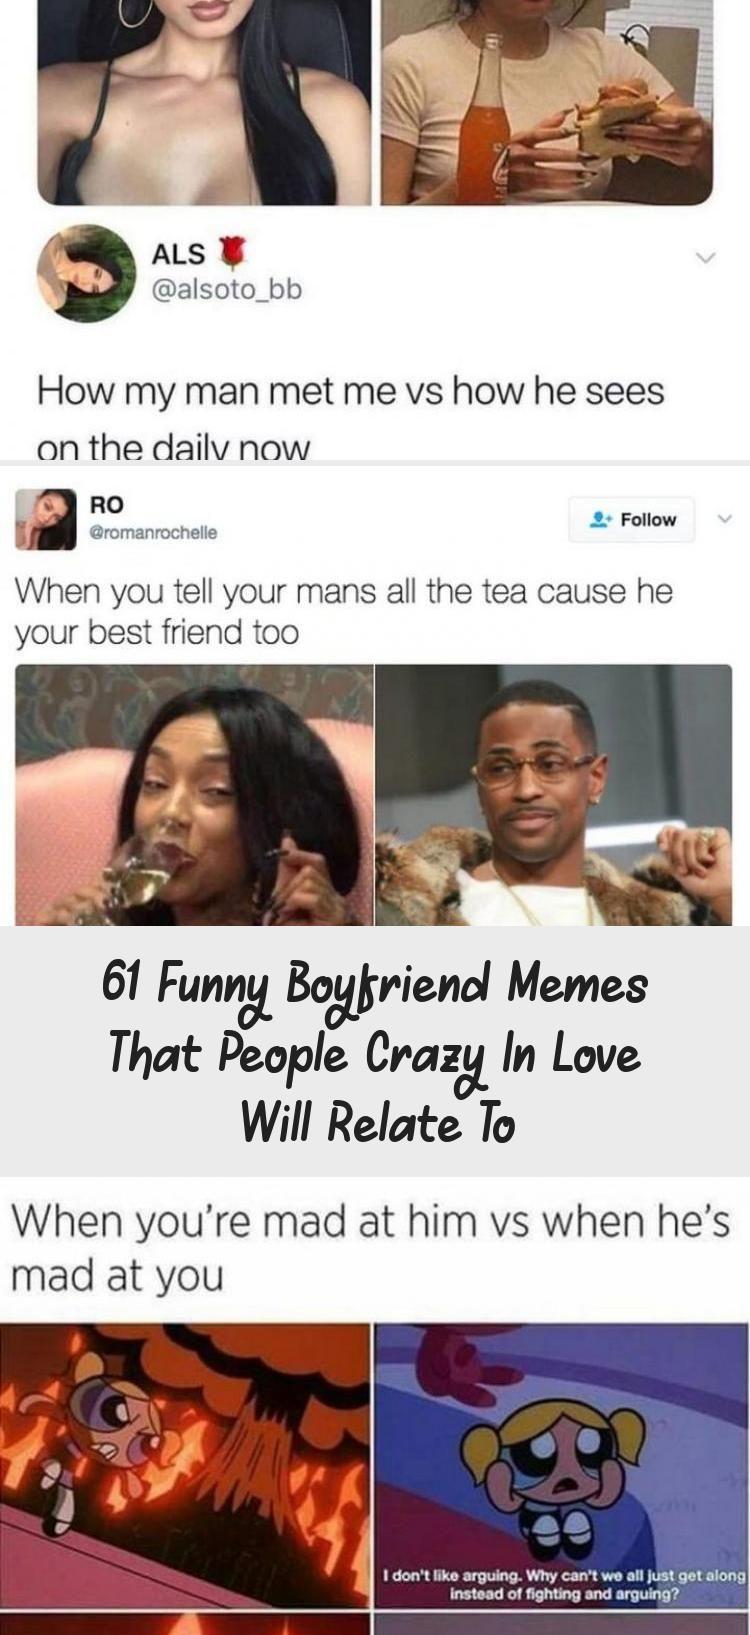 My Man Meme : Funny, Boyfriend, Memes,, Memes, Boyfriend,